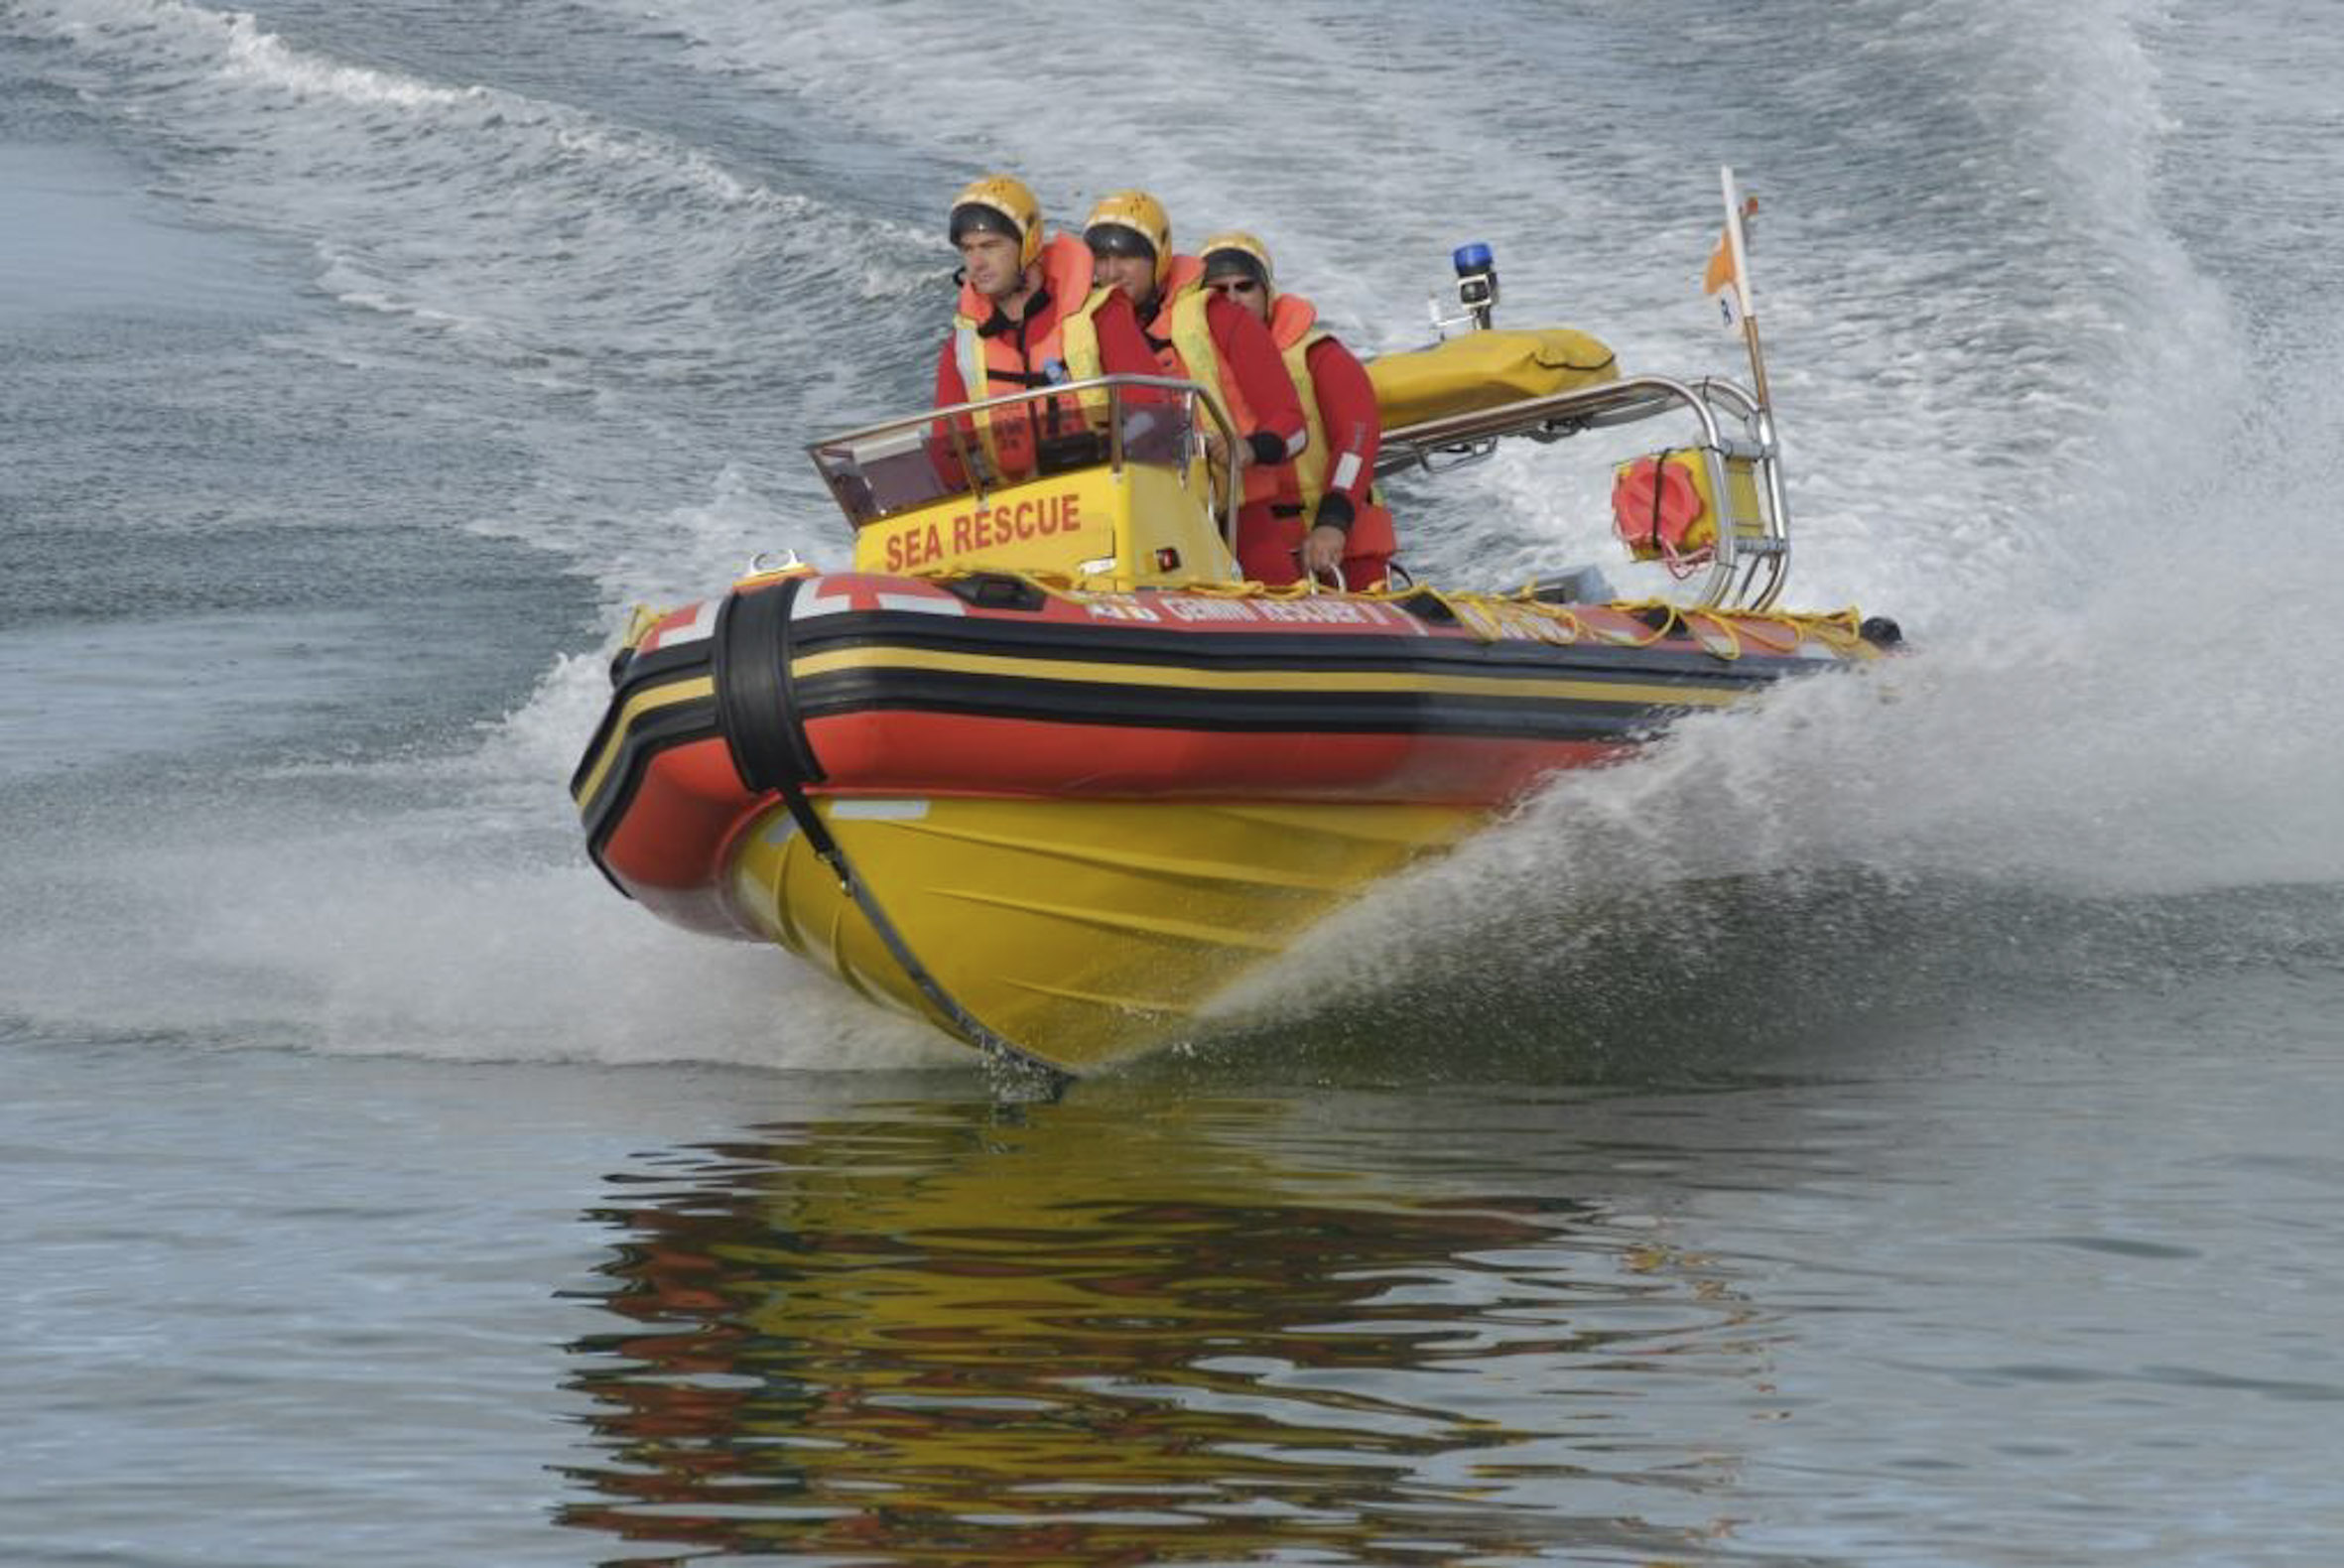 Mykonos rescue boat Gemini Rescuer II.